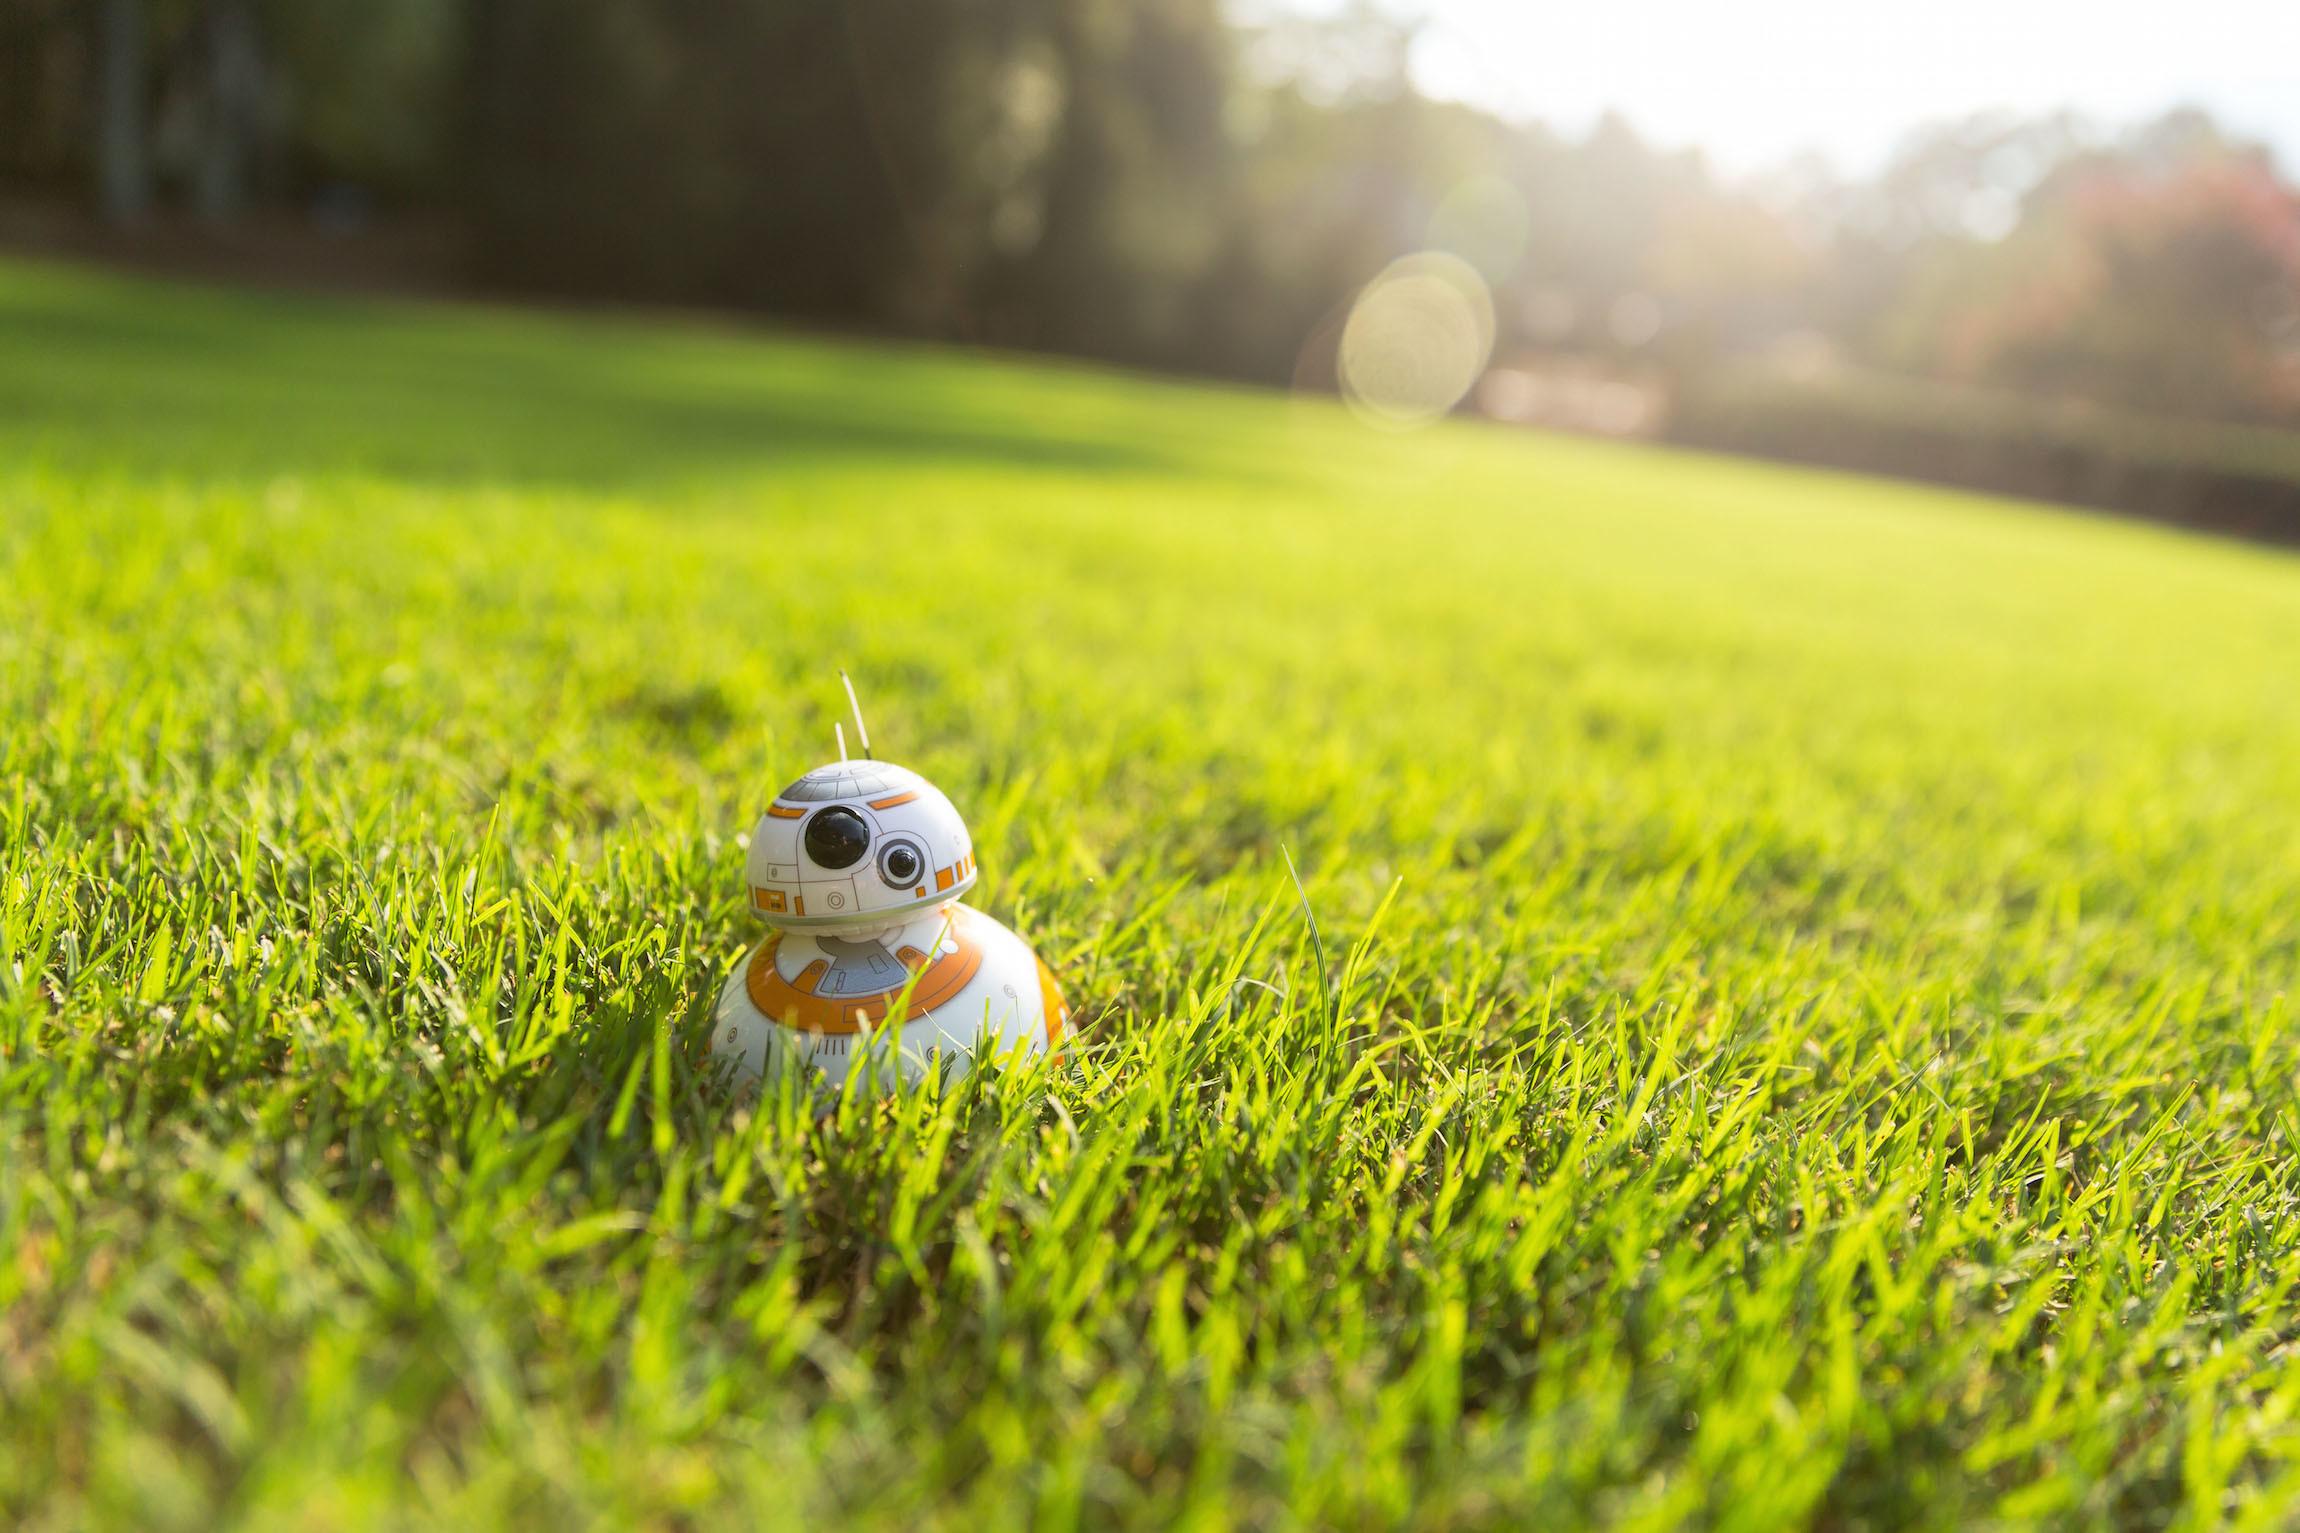 Sphero BB-8 in grass